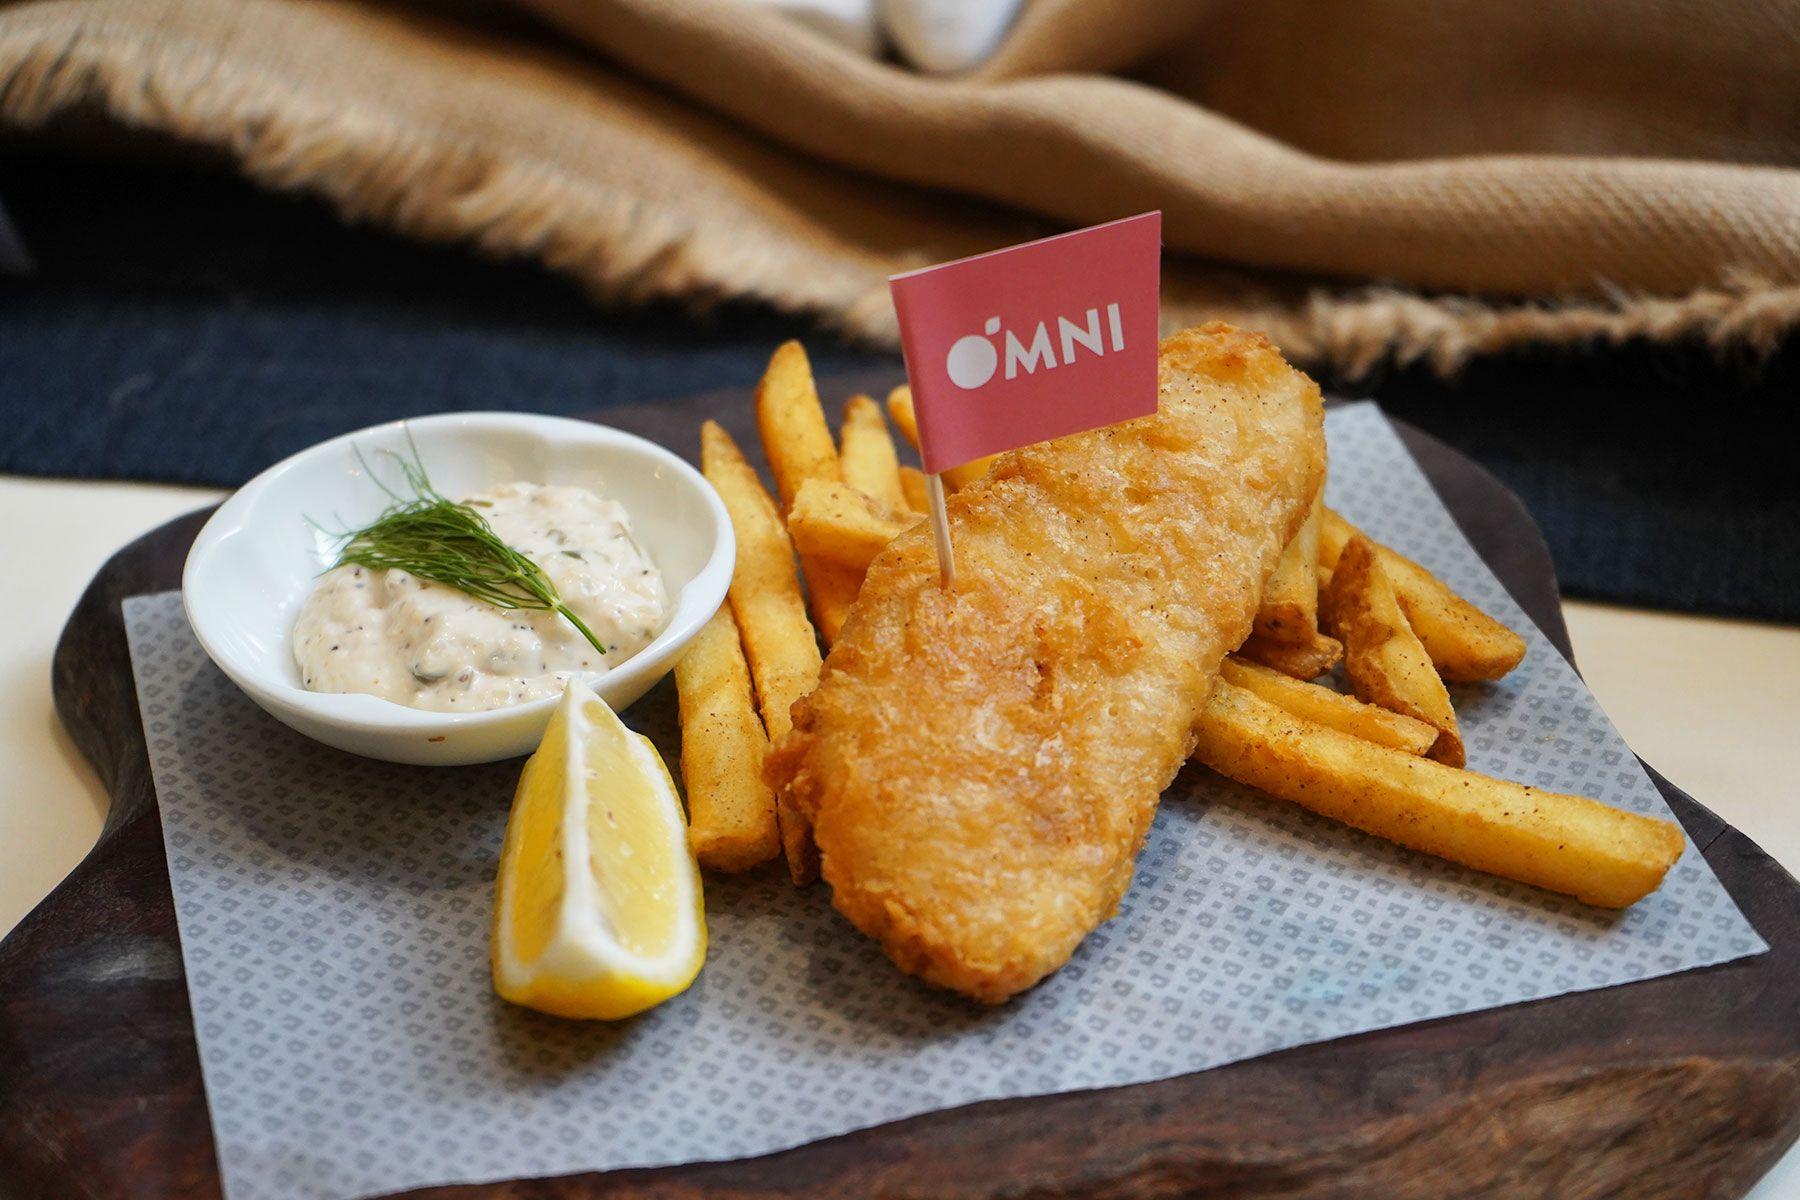 OmniFoods Presents Plant-Based Seafood Next